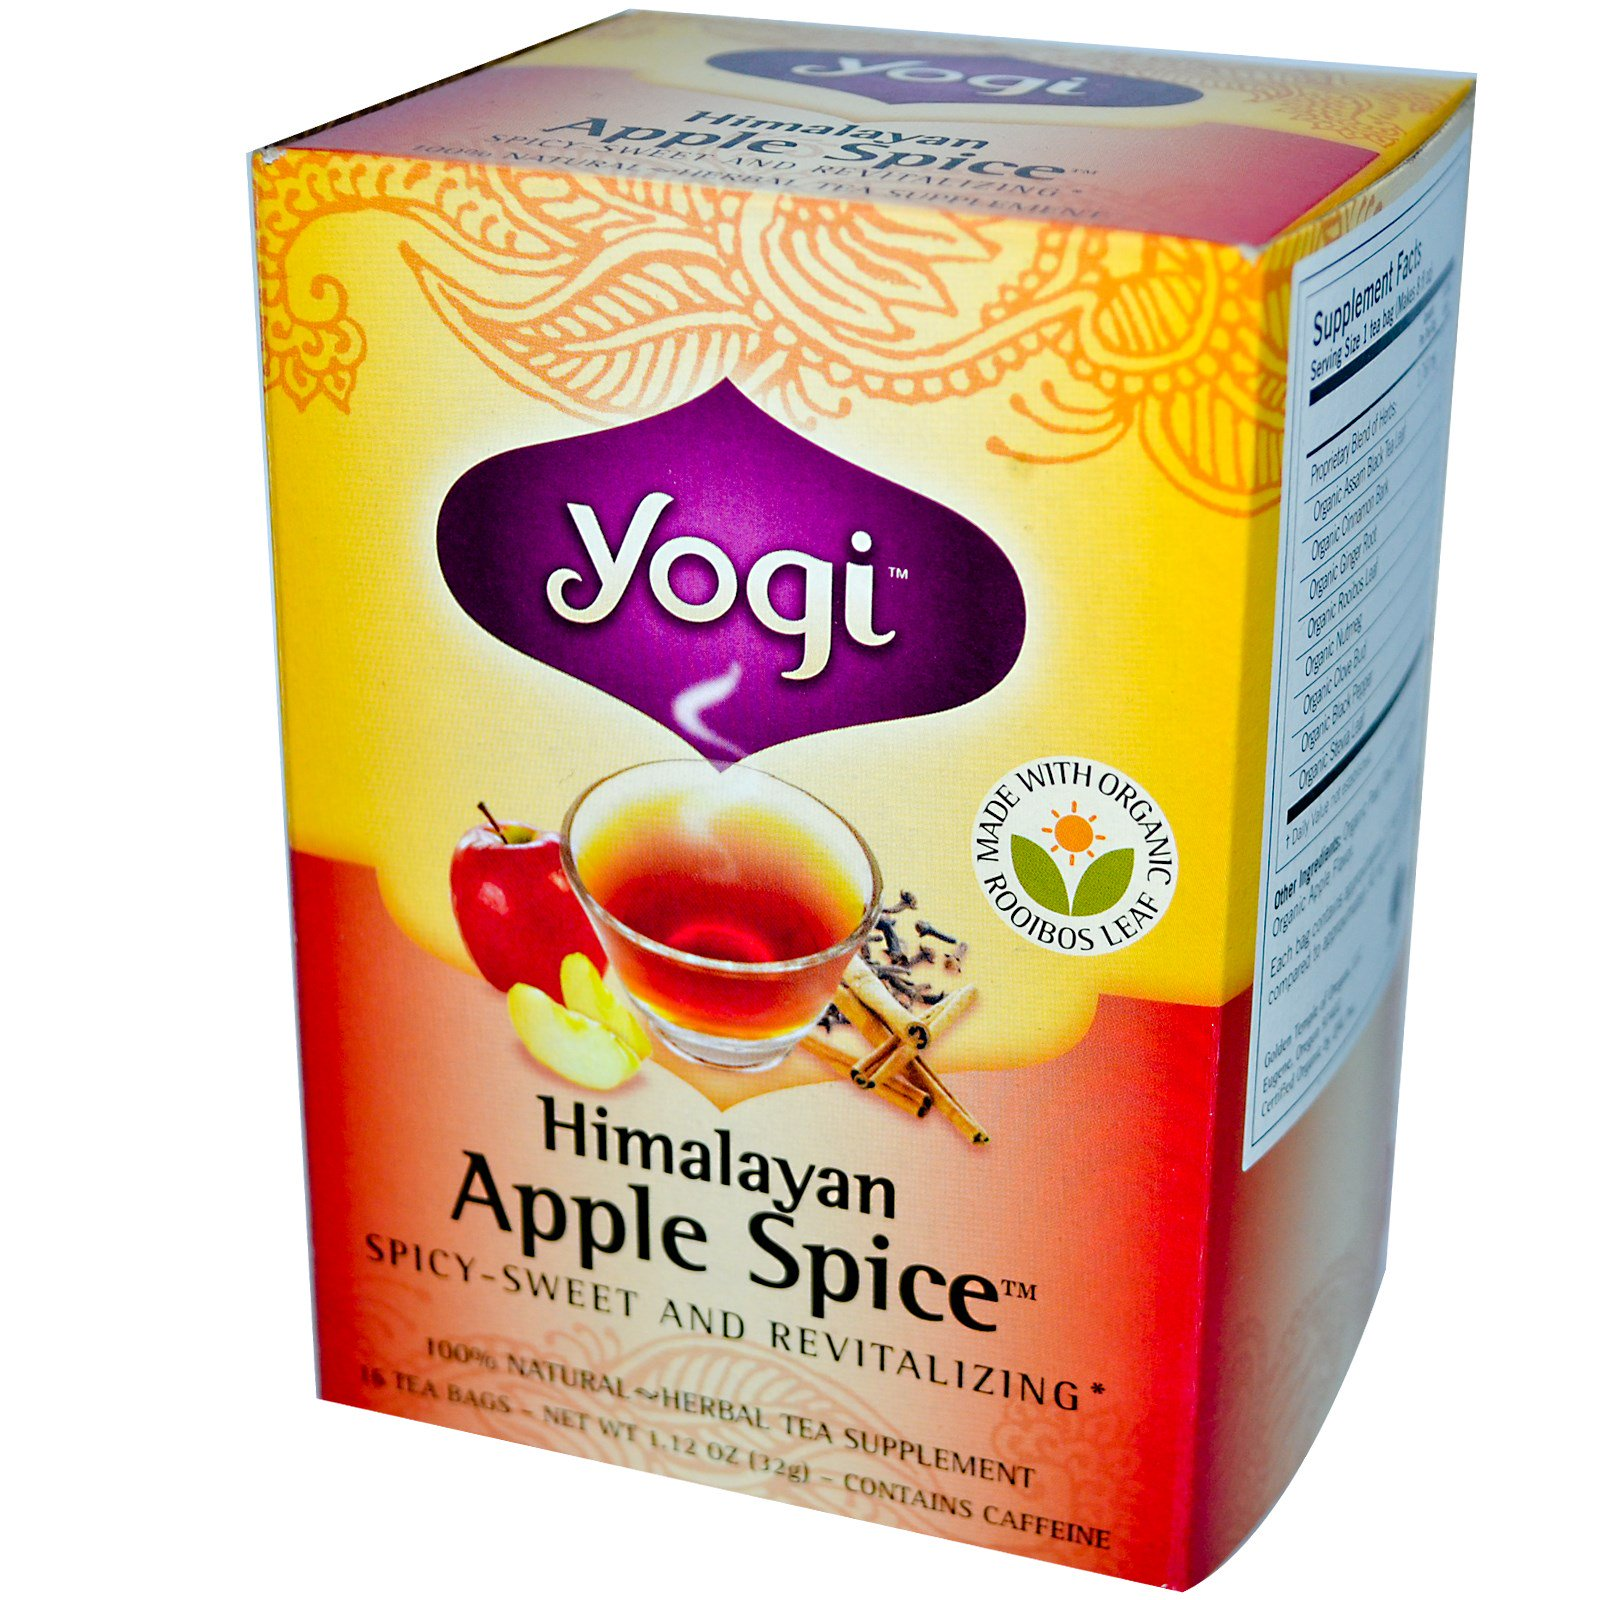 Yogi Tea, Himalayan Apple Spice